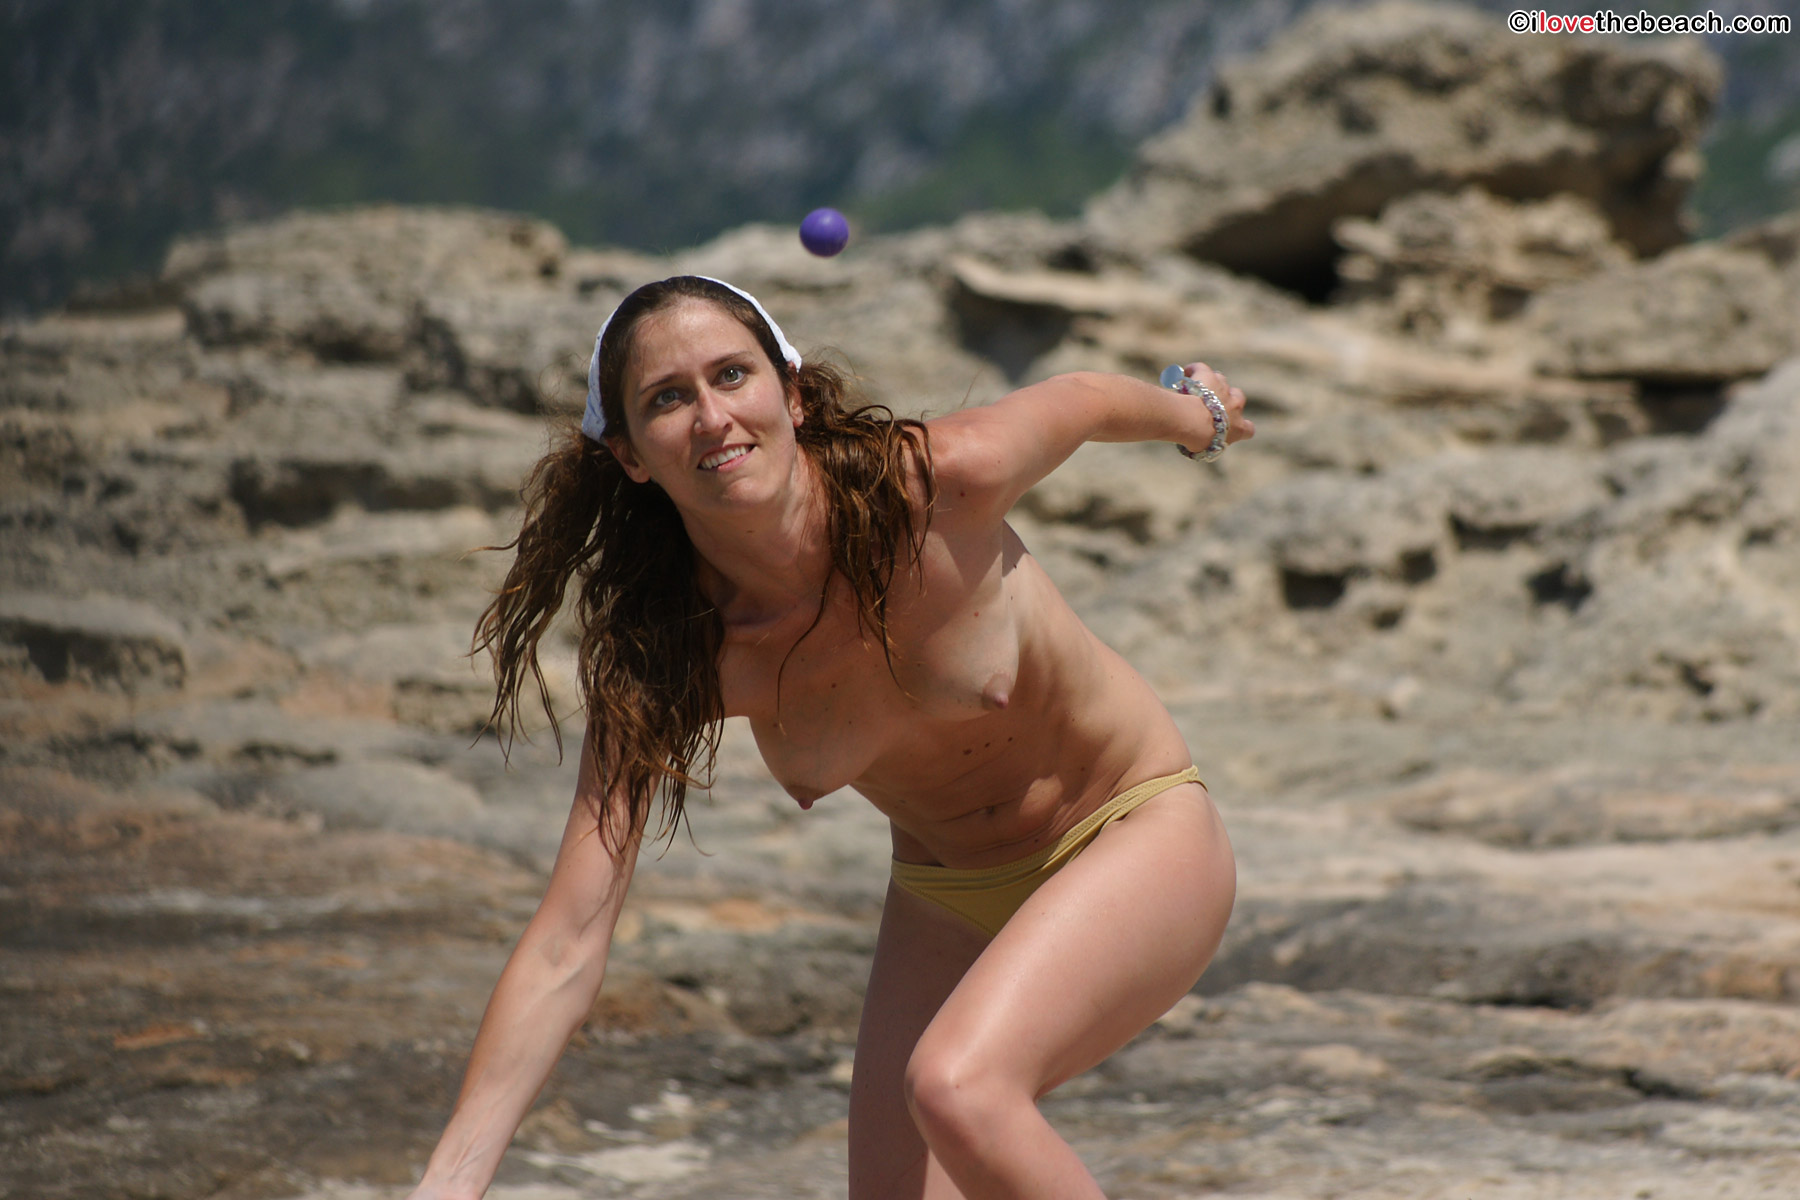 beach-nude-pics-2